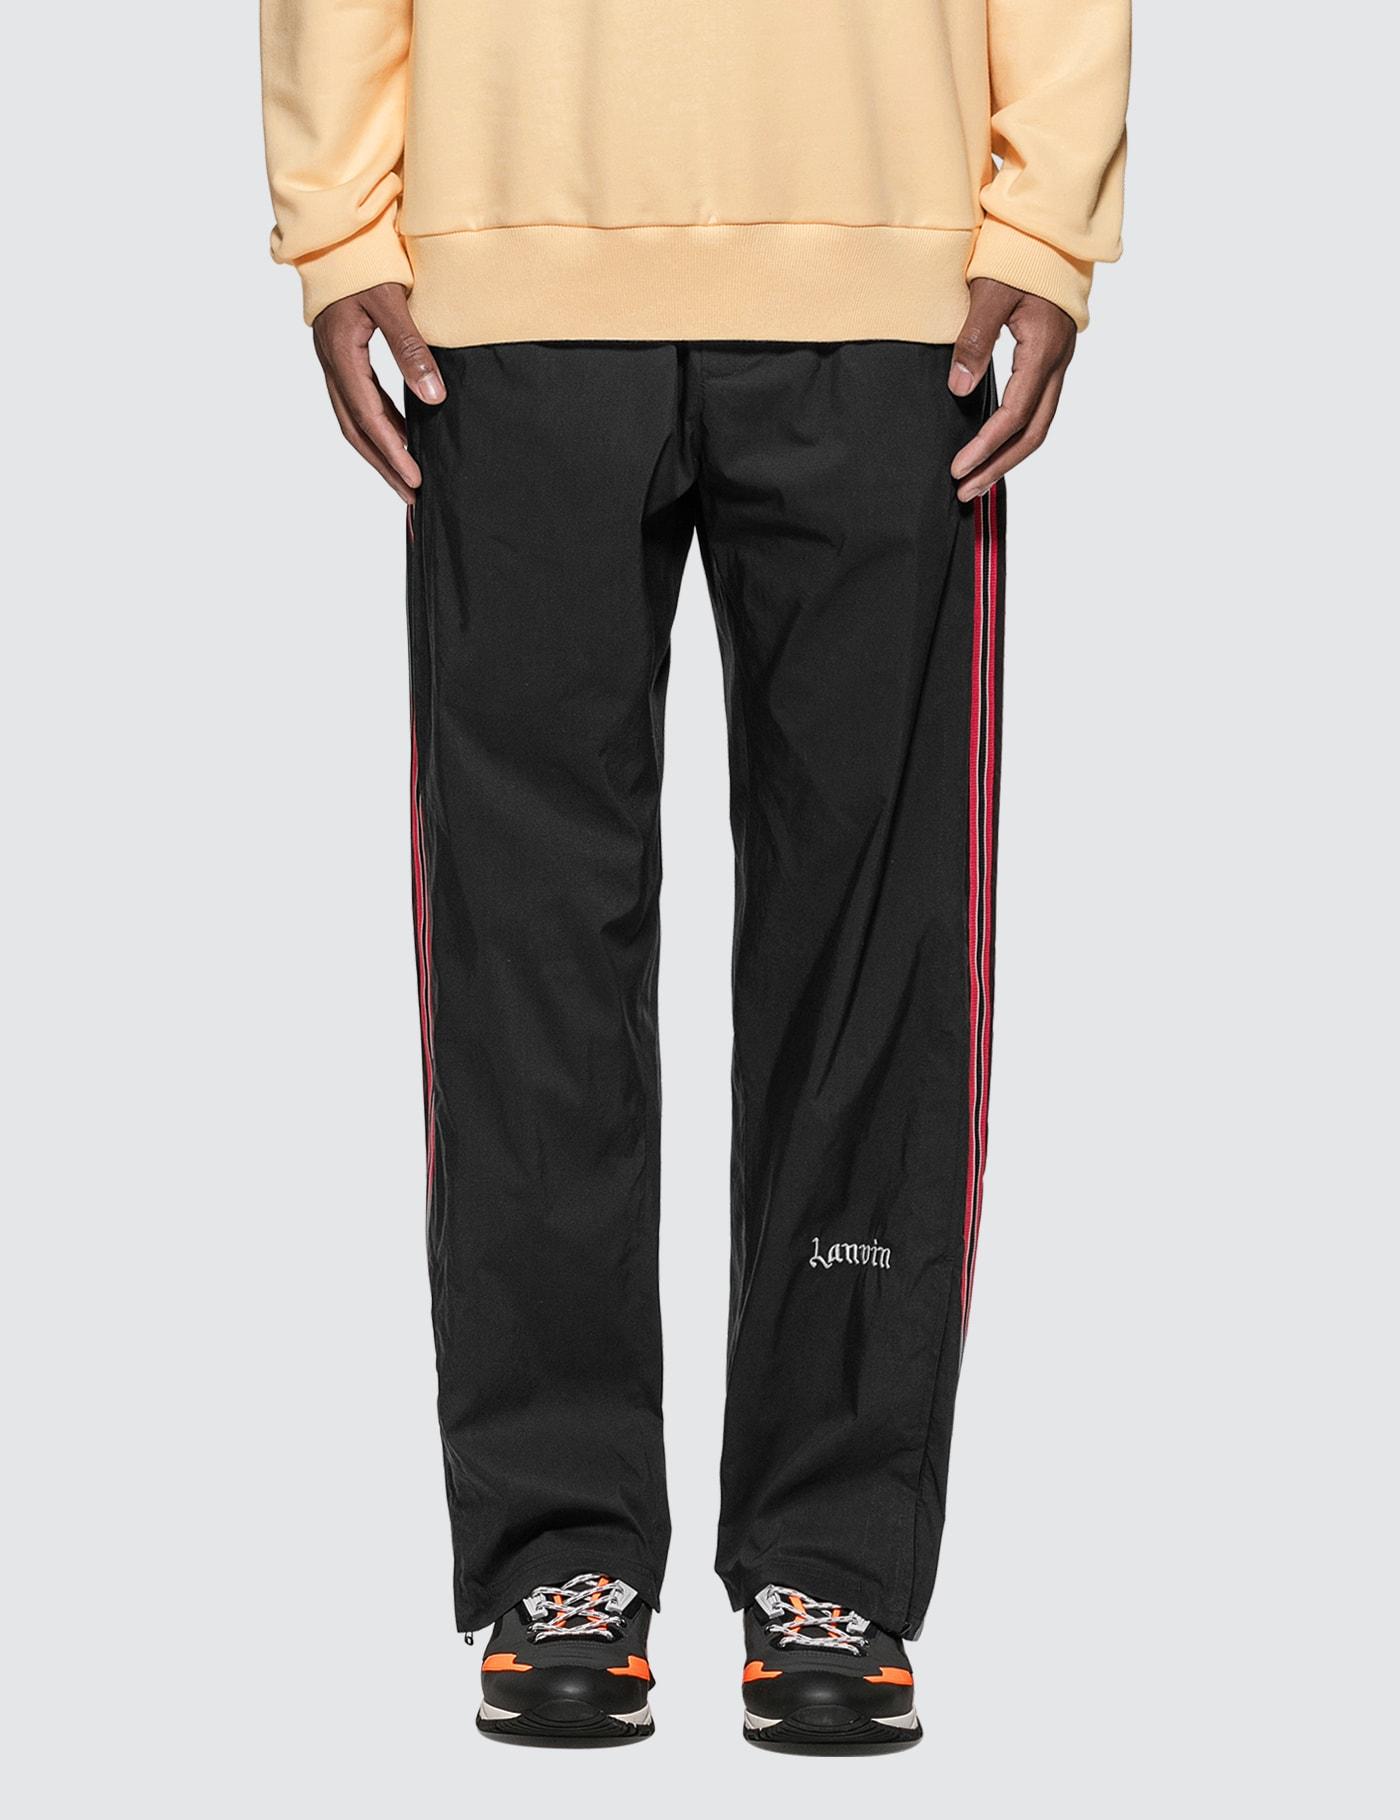 Lanvin Track Pants